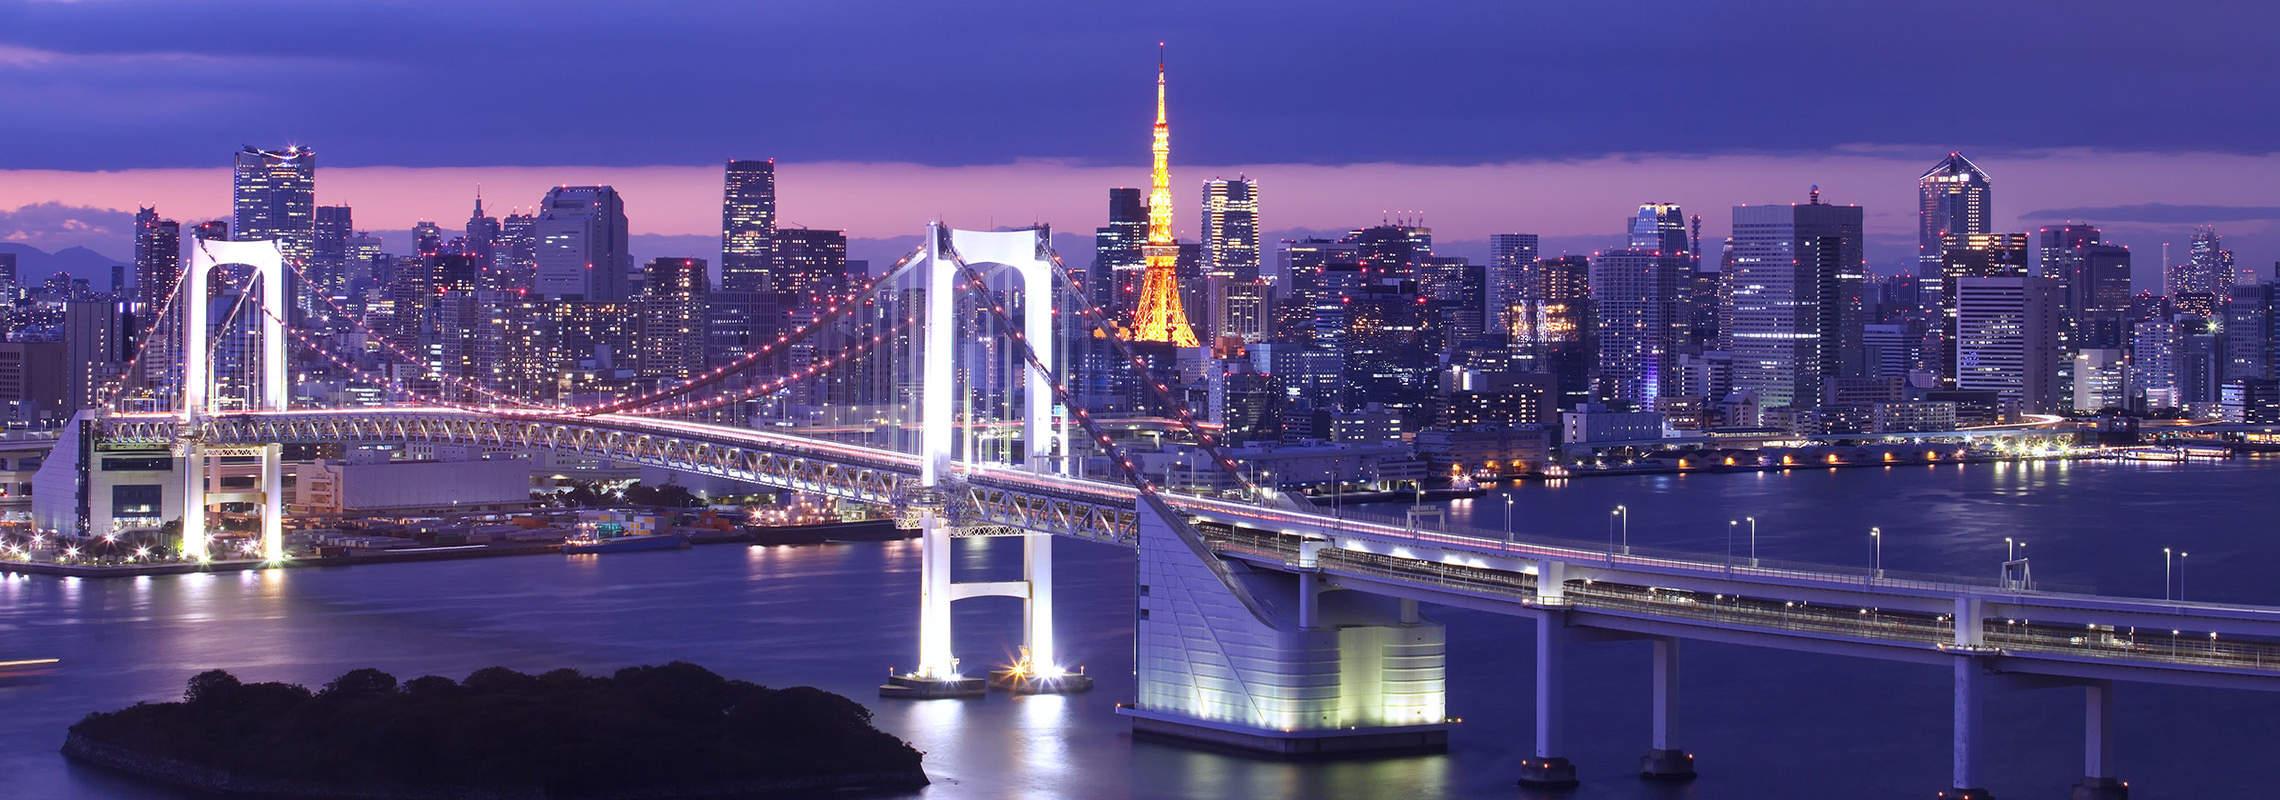 Tokyo Skyline with Rainbow Bridge and Tokyo Tower